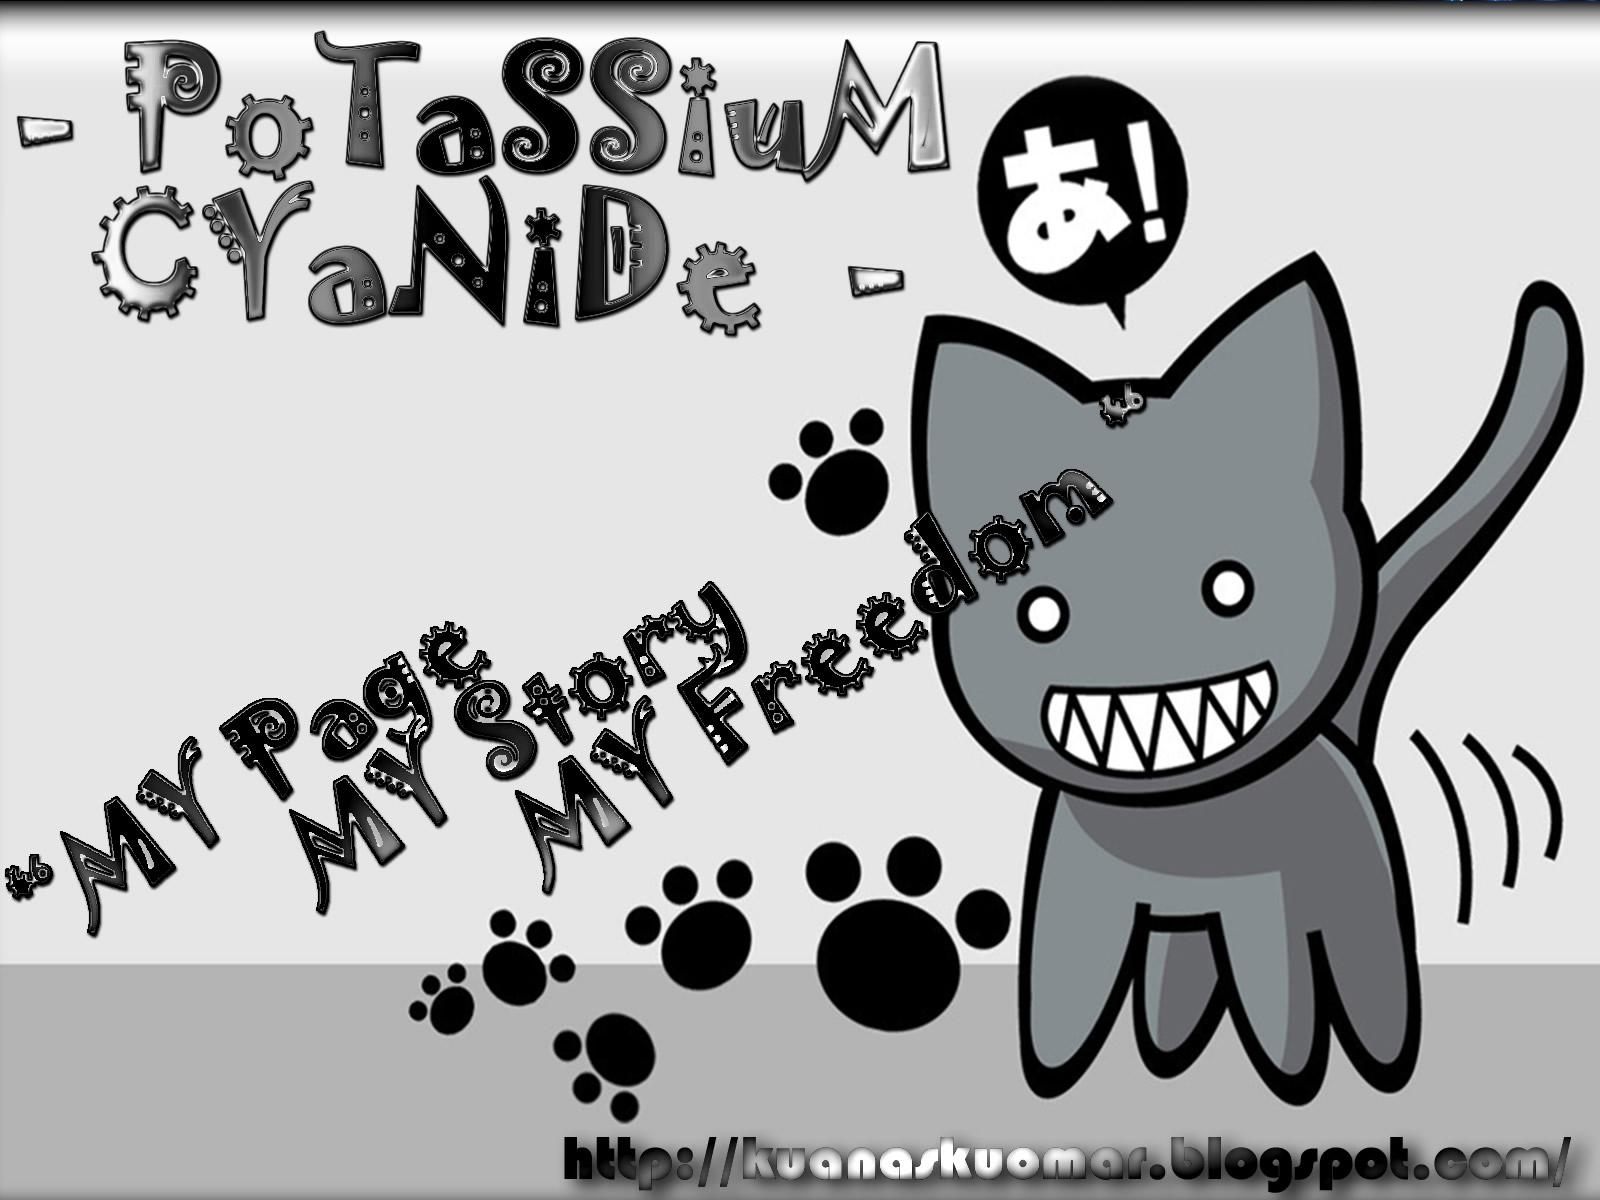 ~Potassium Cyanide~